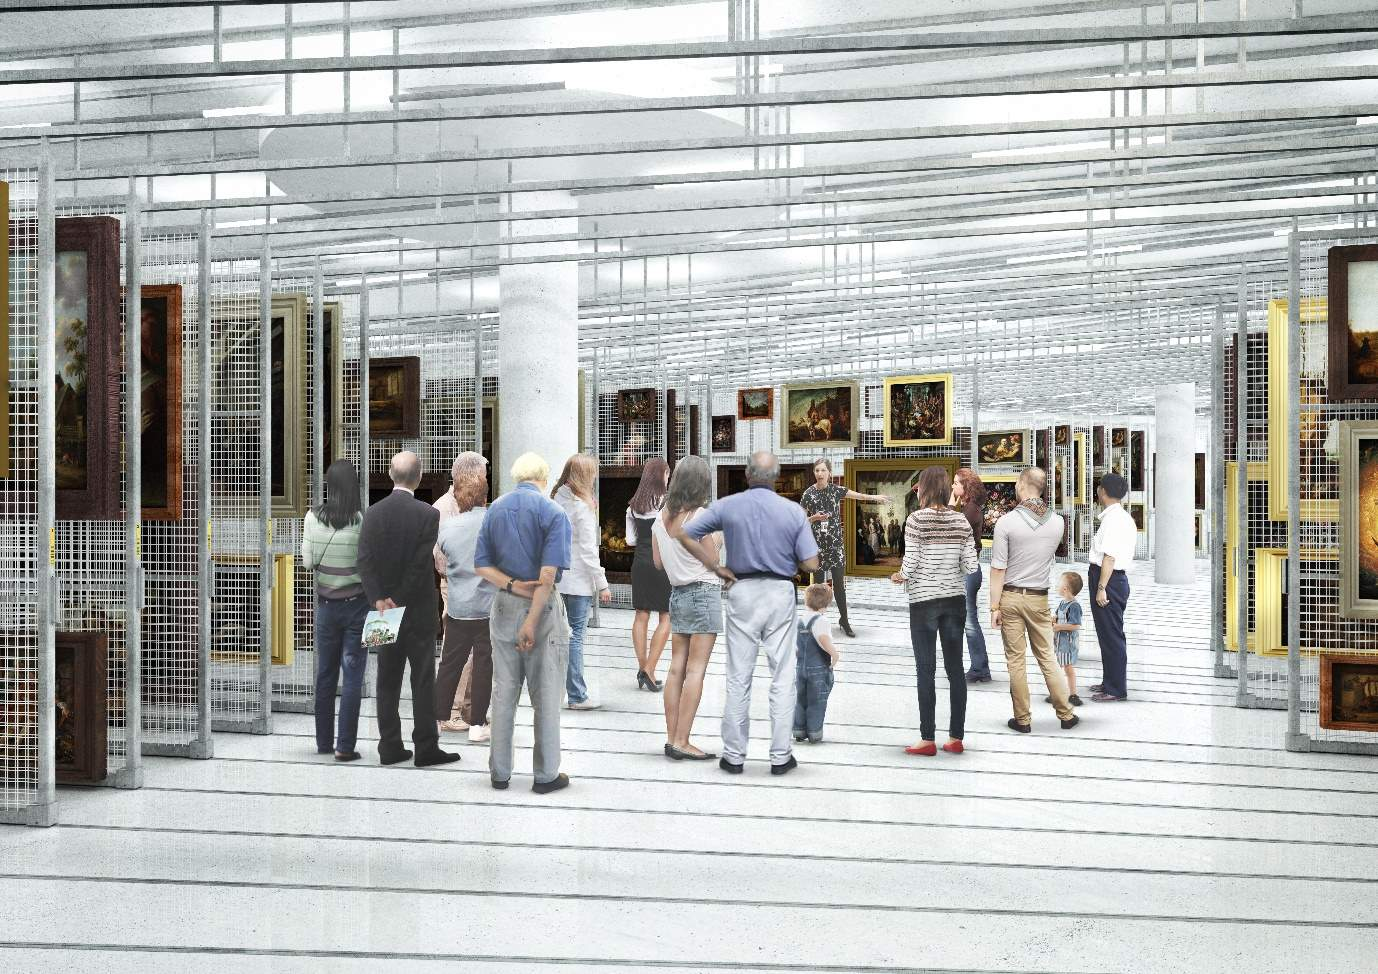 Boijmans van Beuningen art museum: smart, energy-efficient installations at new art depot to reduce consumption by up to 40%, © MVRDV architects